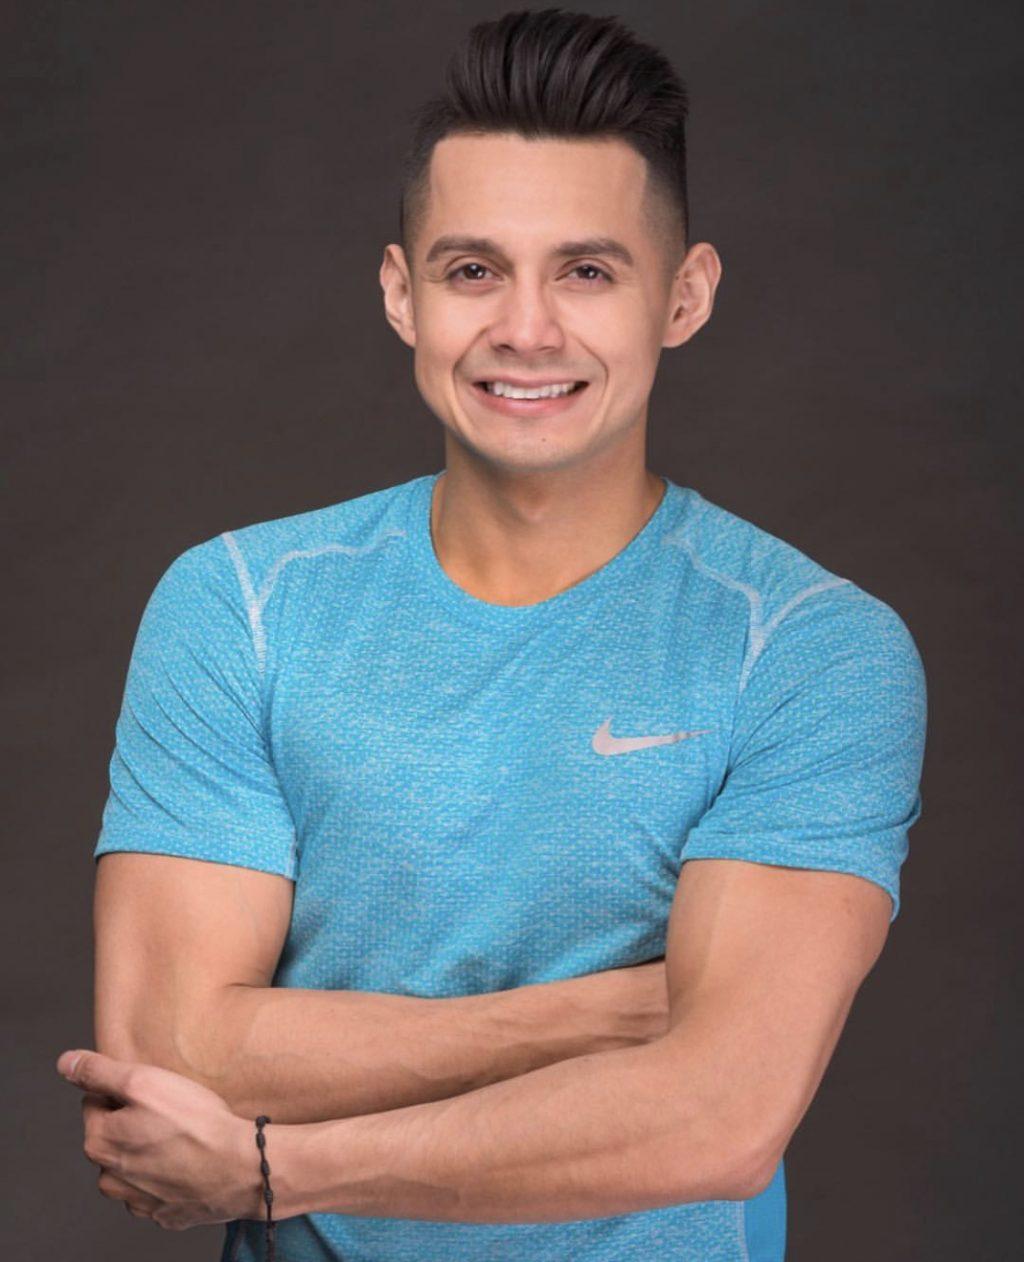 Personal Trainer Chicago, Illinois - Edwin Ramirez